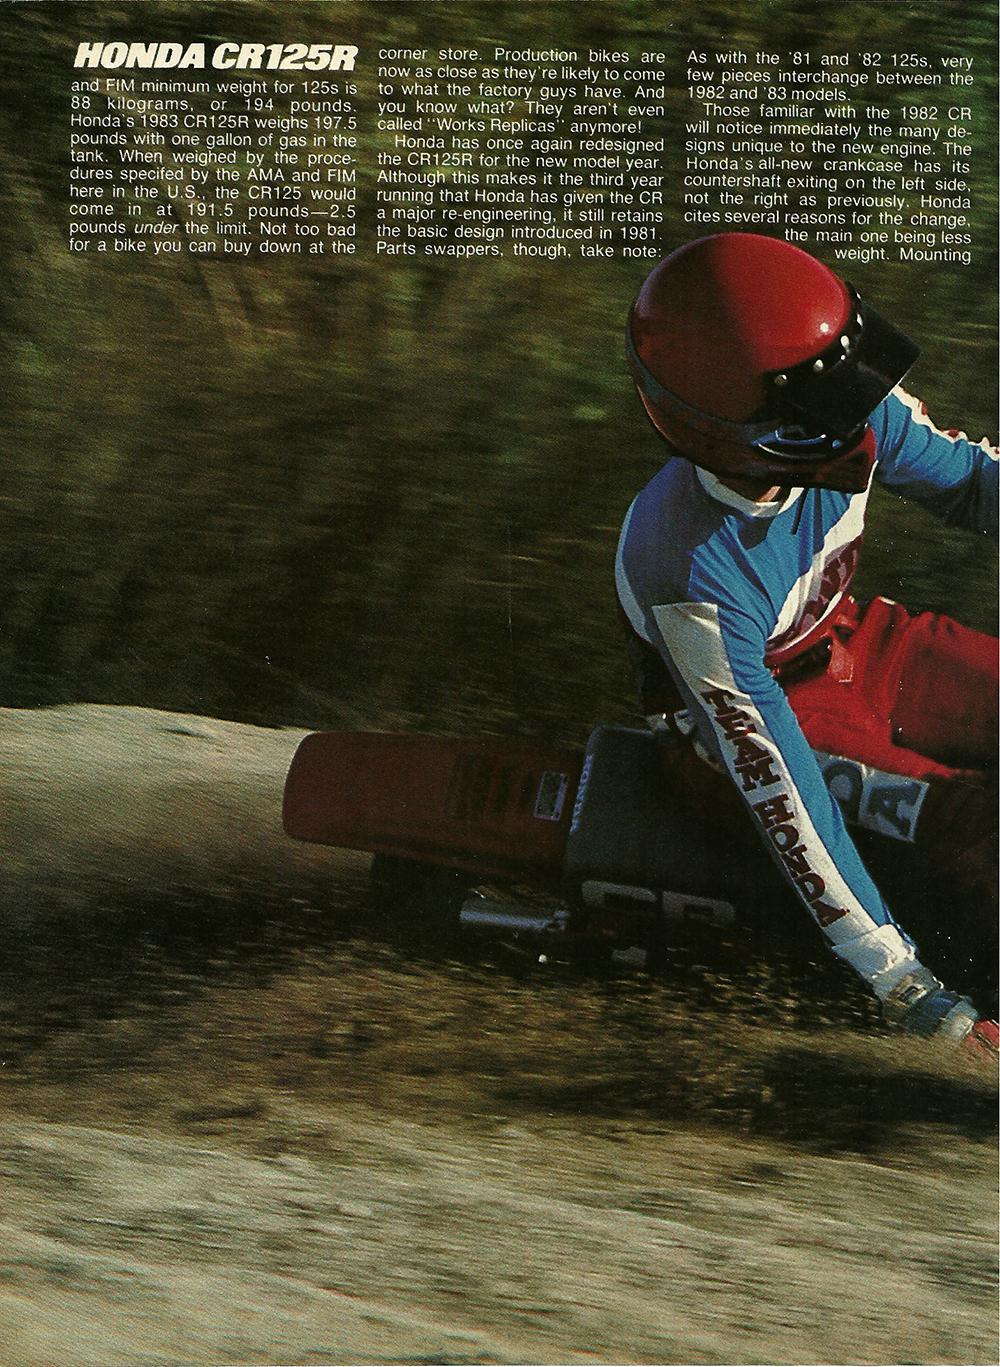 1983 Honda CR125R road test 3.jpg